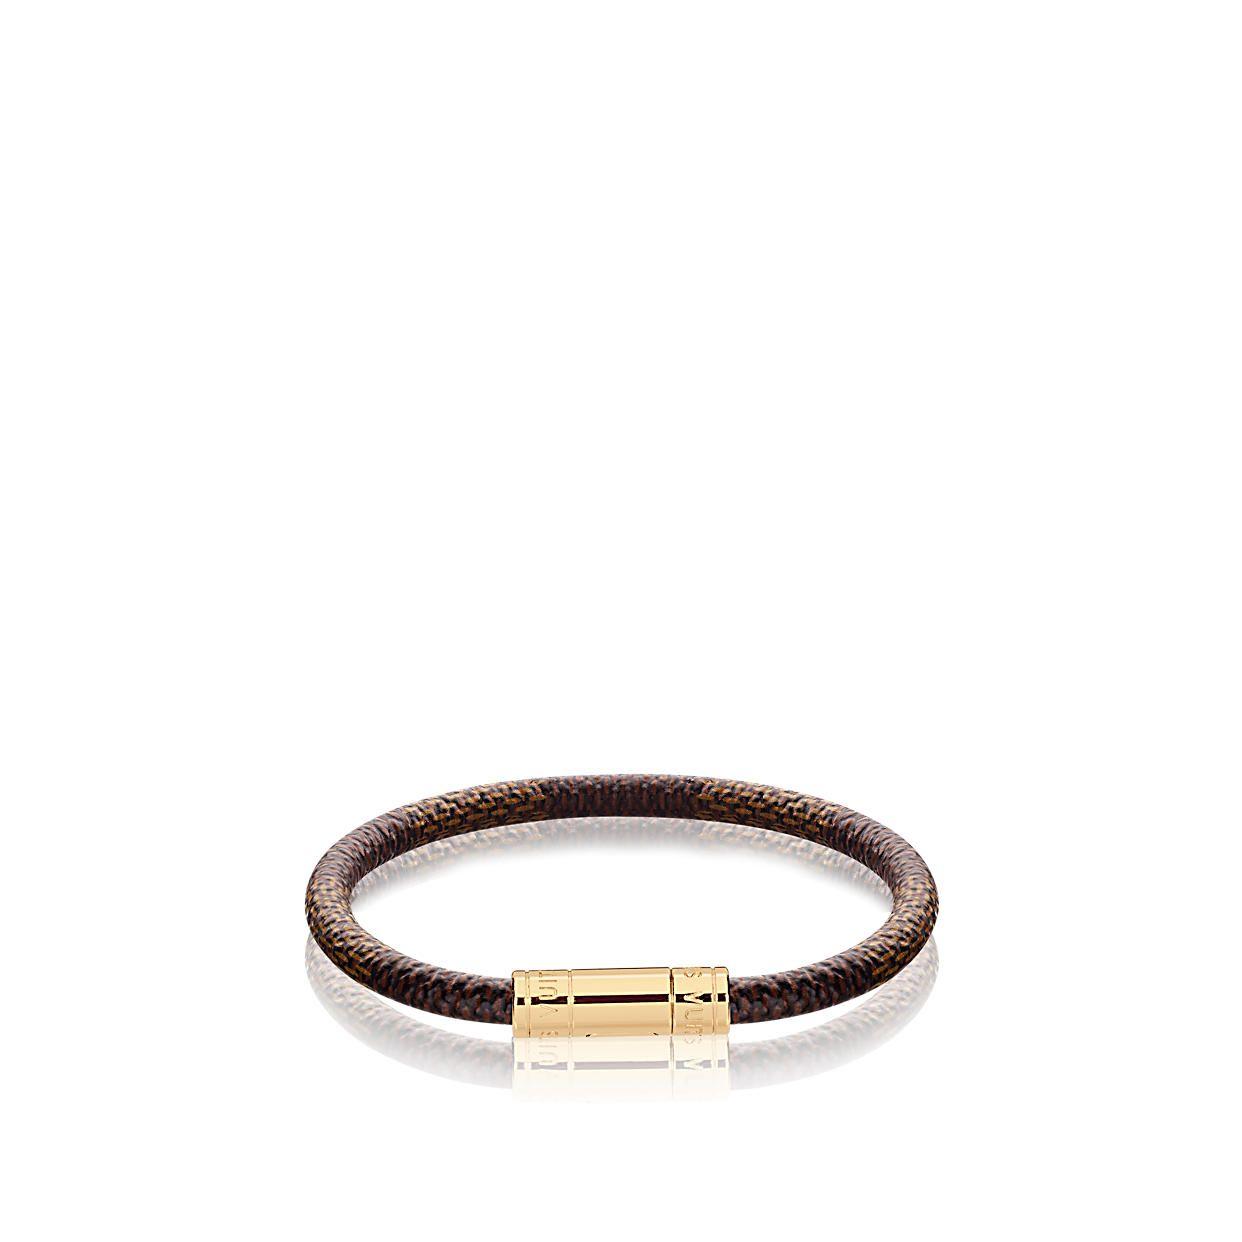 Keep It Armband Lederarmband Damen Armband Leder Und Louis Vuitton